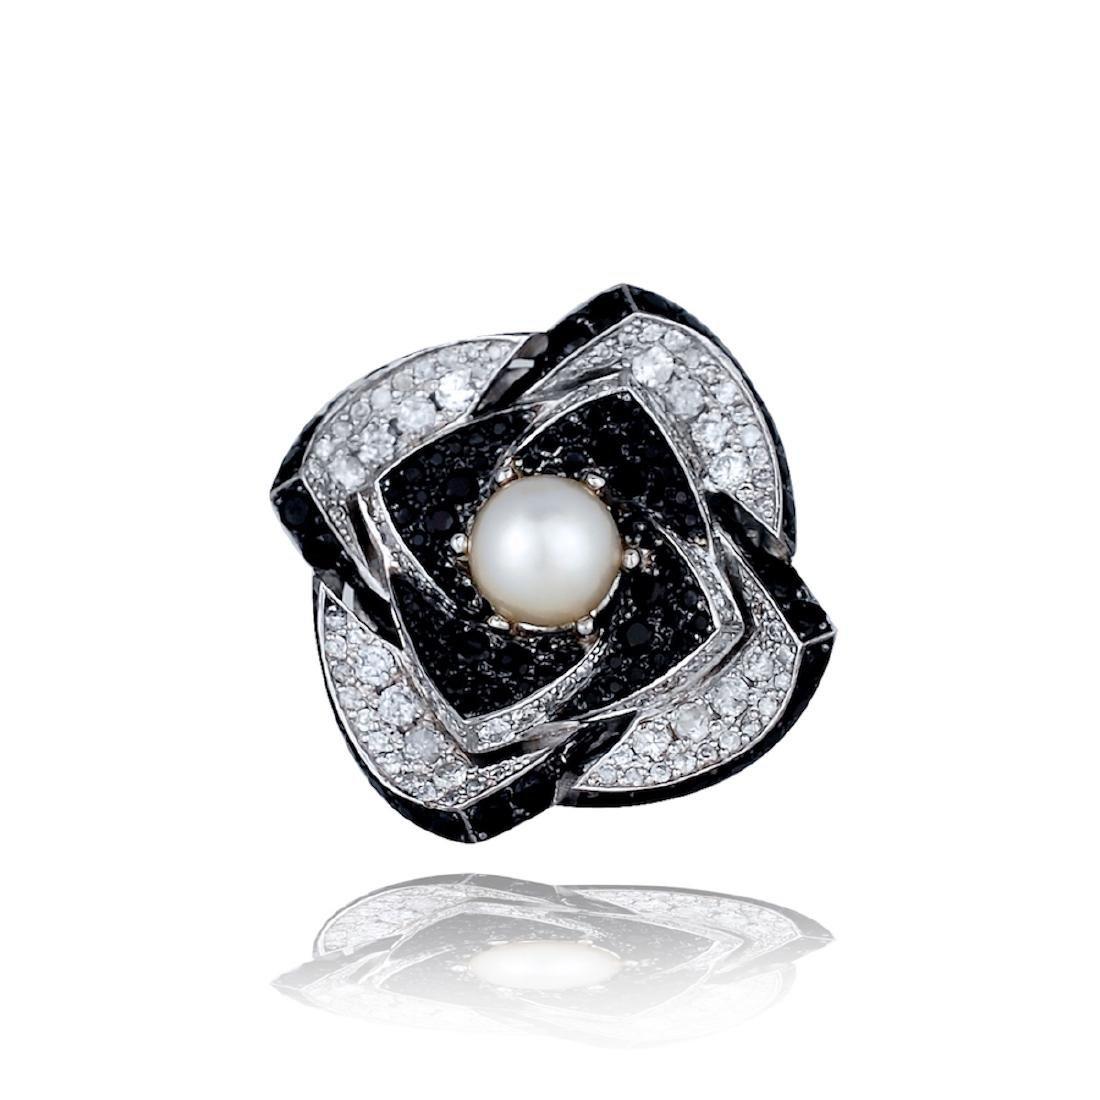 Art Deco, Large 9 TCW Flower Ring, Diamonds, Black - 2